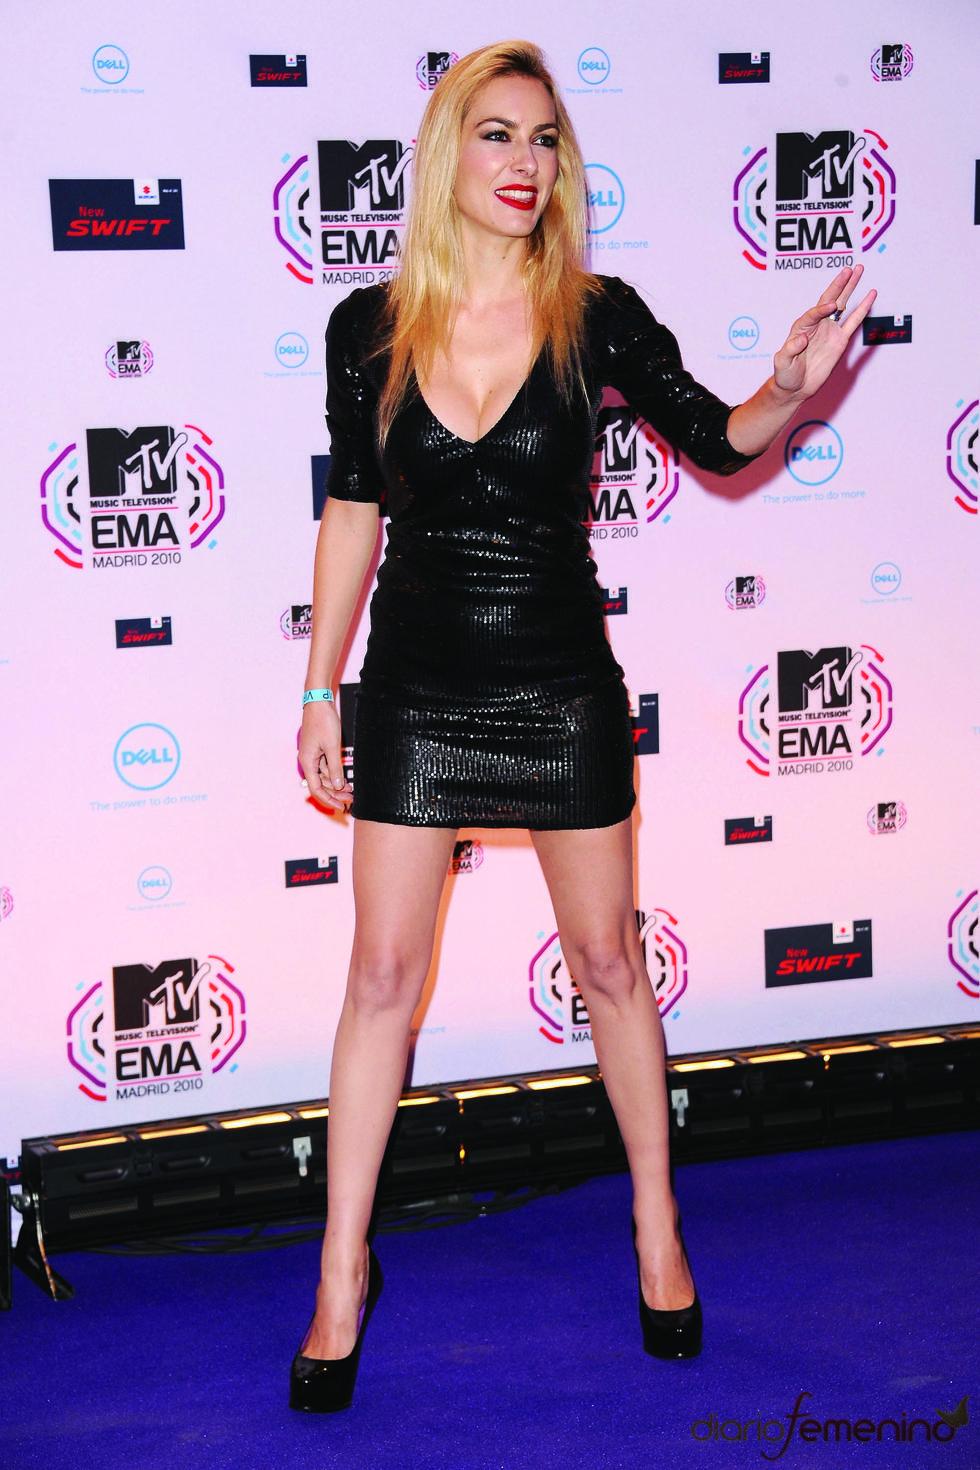 Kira Miró embutida en los MTV Europe Music Awards